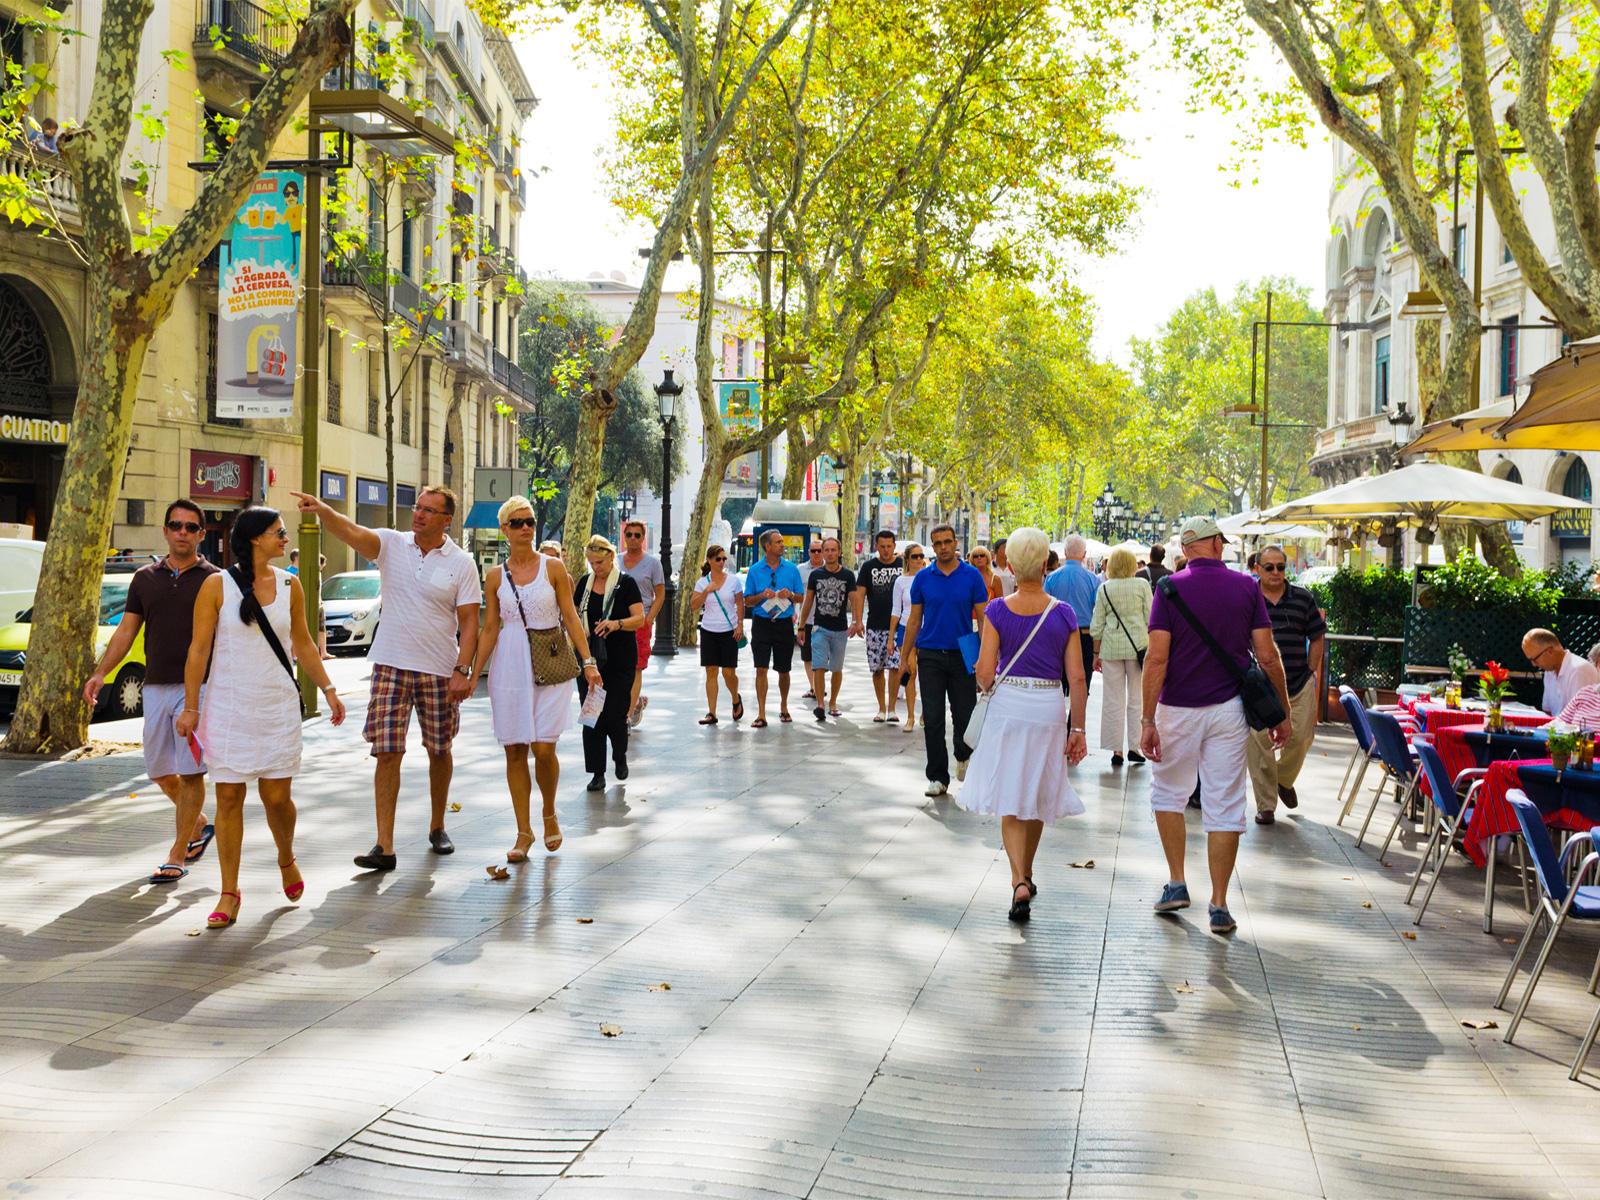 Hoteles vincci oferta hotel espa a portugal t nez - Hoteles vincci barcelona ...